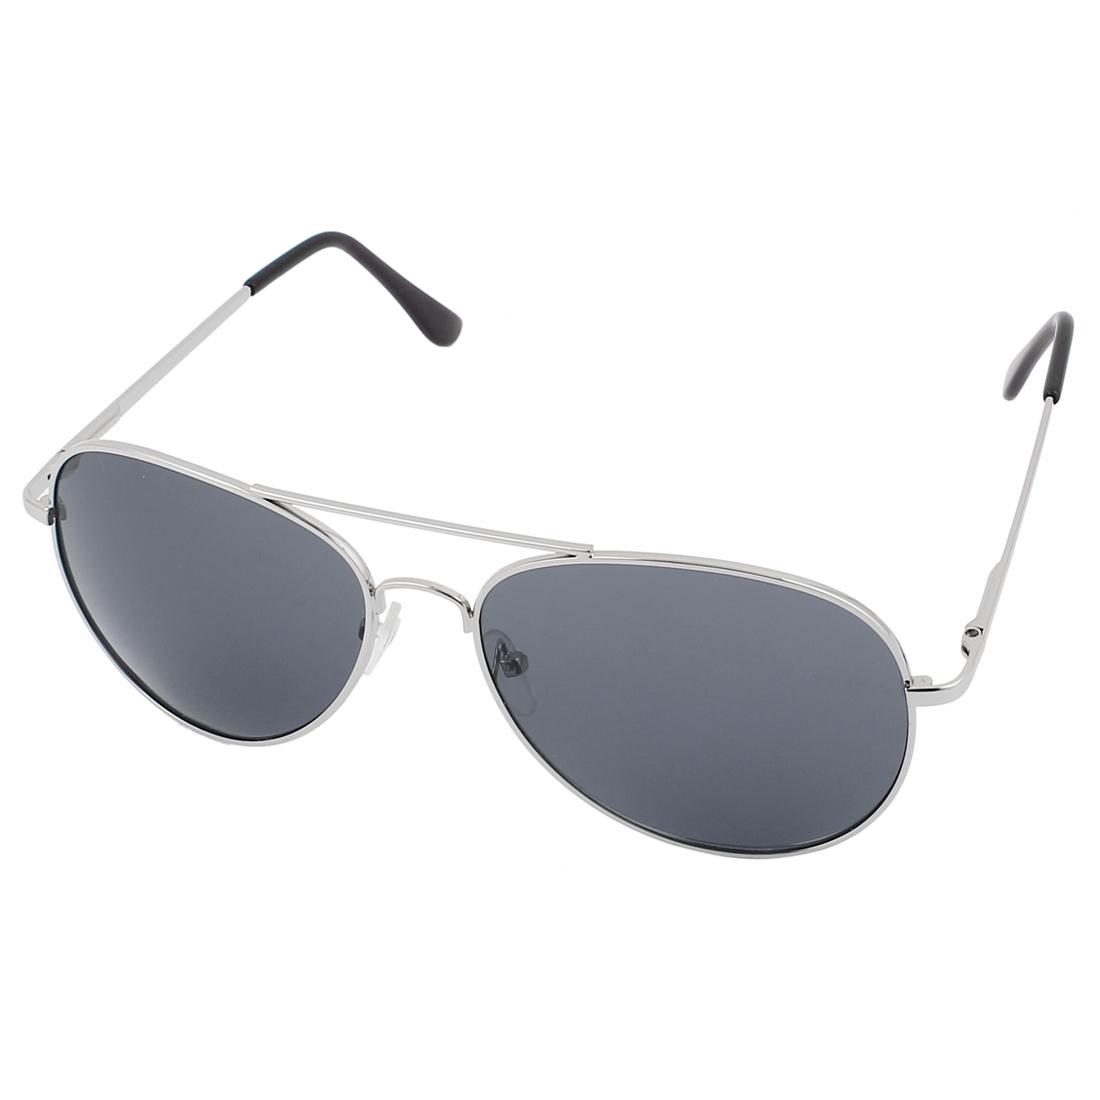 Men Outdoor Casual Double Bridge Silver Tone Metal Full Frame Dark Gray Waterdrop Lens Sunglasses Eyewear Eye Protector Glasses